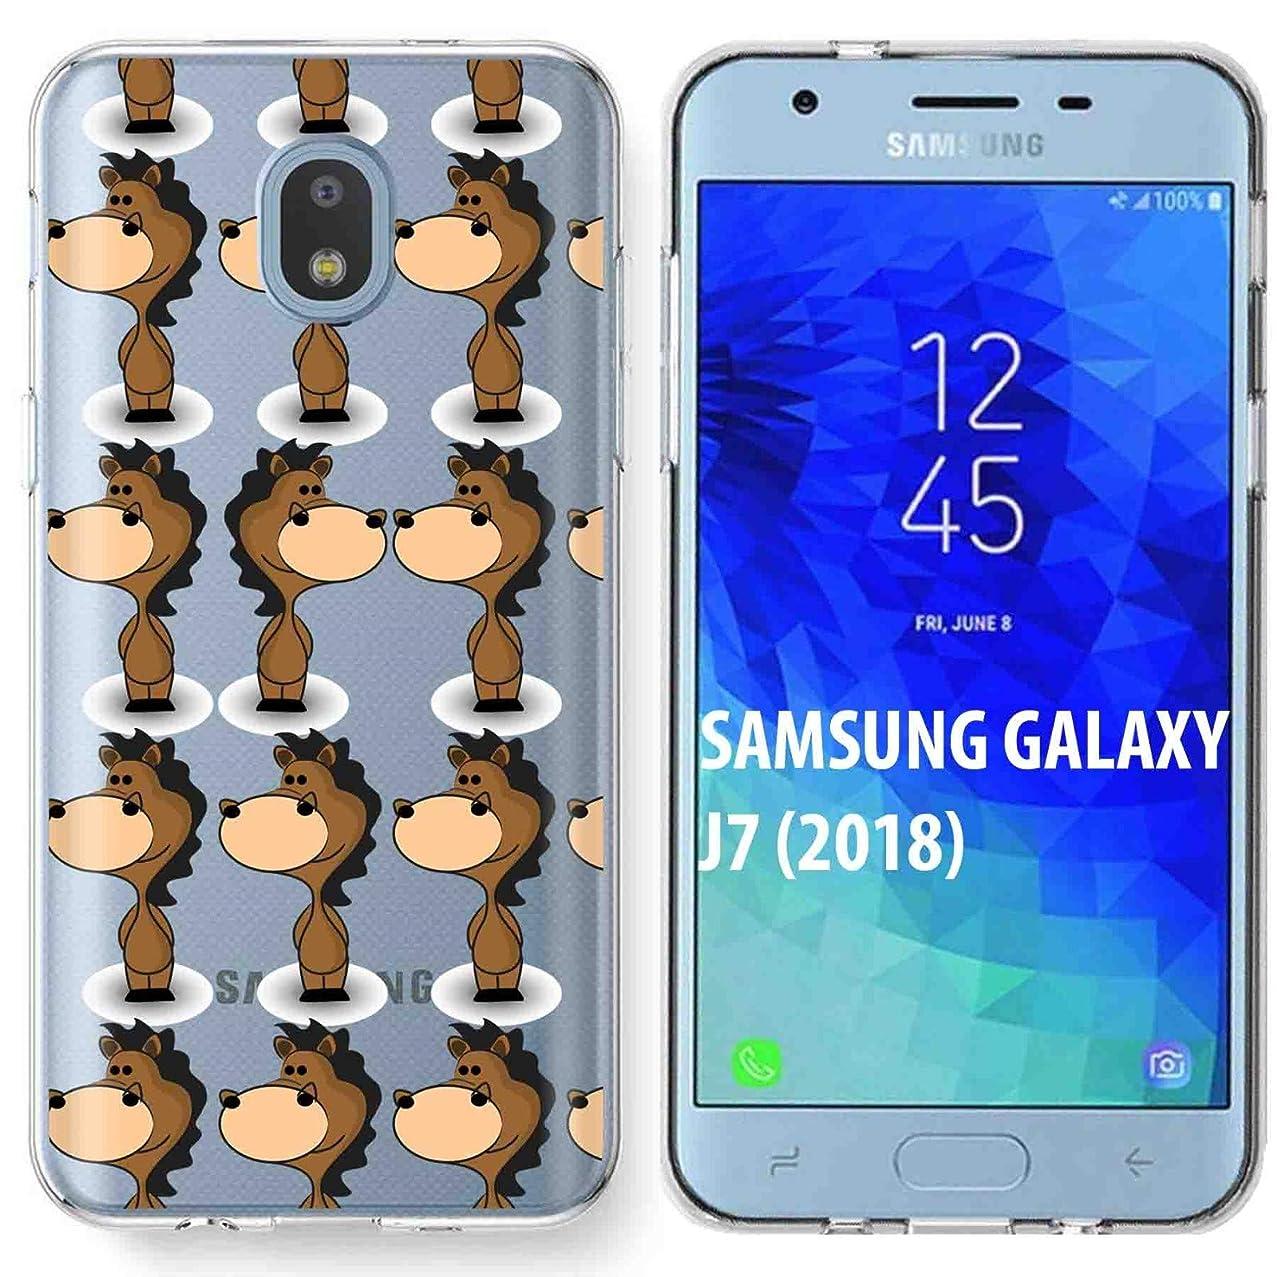 Samsung Galaxy (J7 2018) (J737) Case [TalkingCase] Premium Thin Gel TPU Phone Cover Samsung J7 Refine/J7 Star/J7 Aero/J7 V 2nd Gen/J7 Crown/J7 Aura/J7 Top [Horse One Zodiac] Design